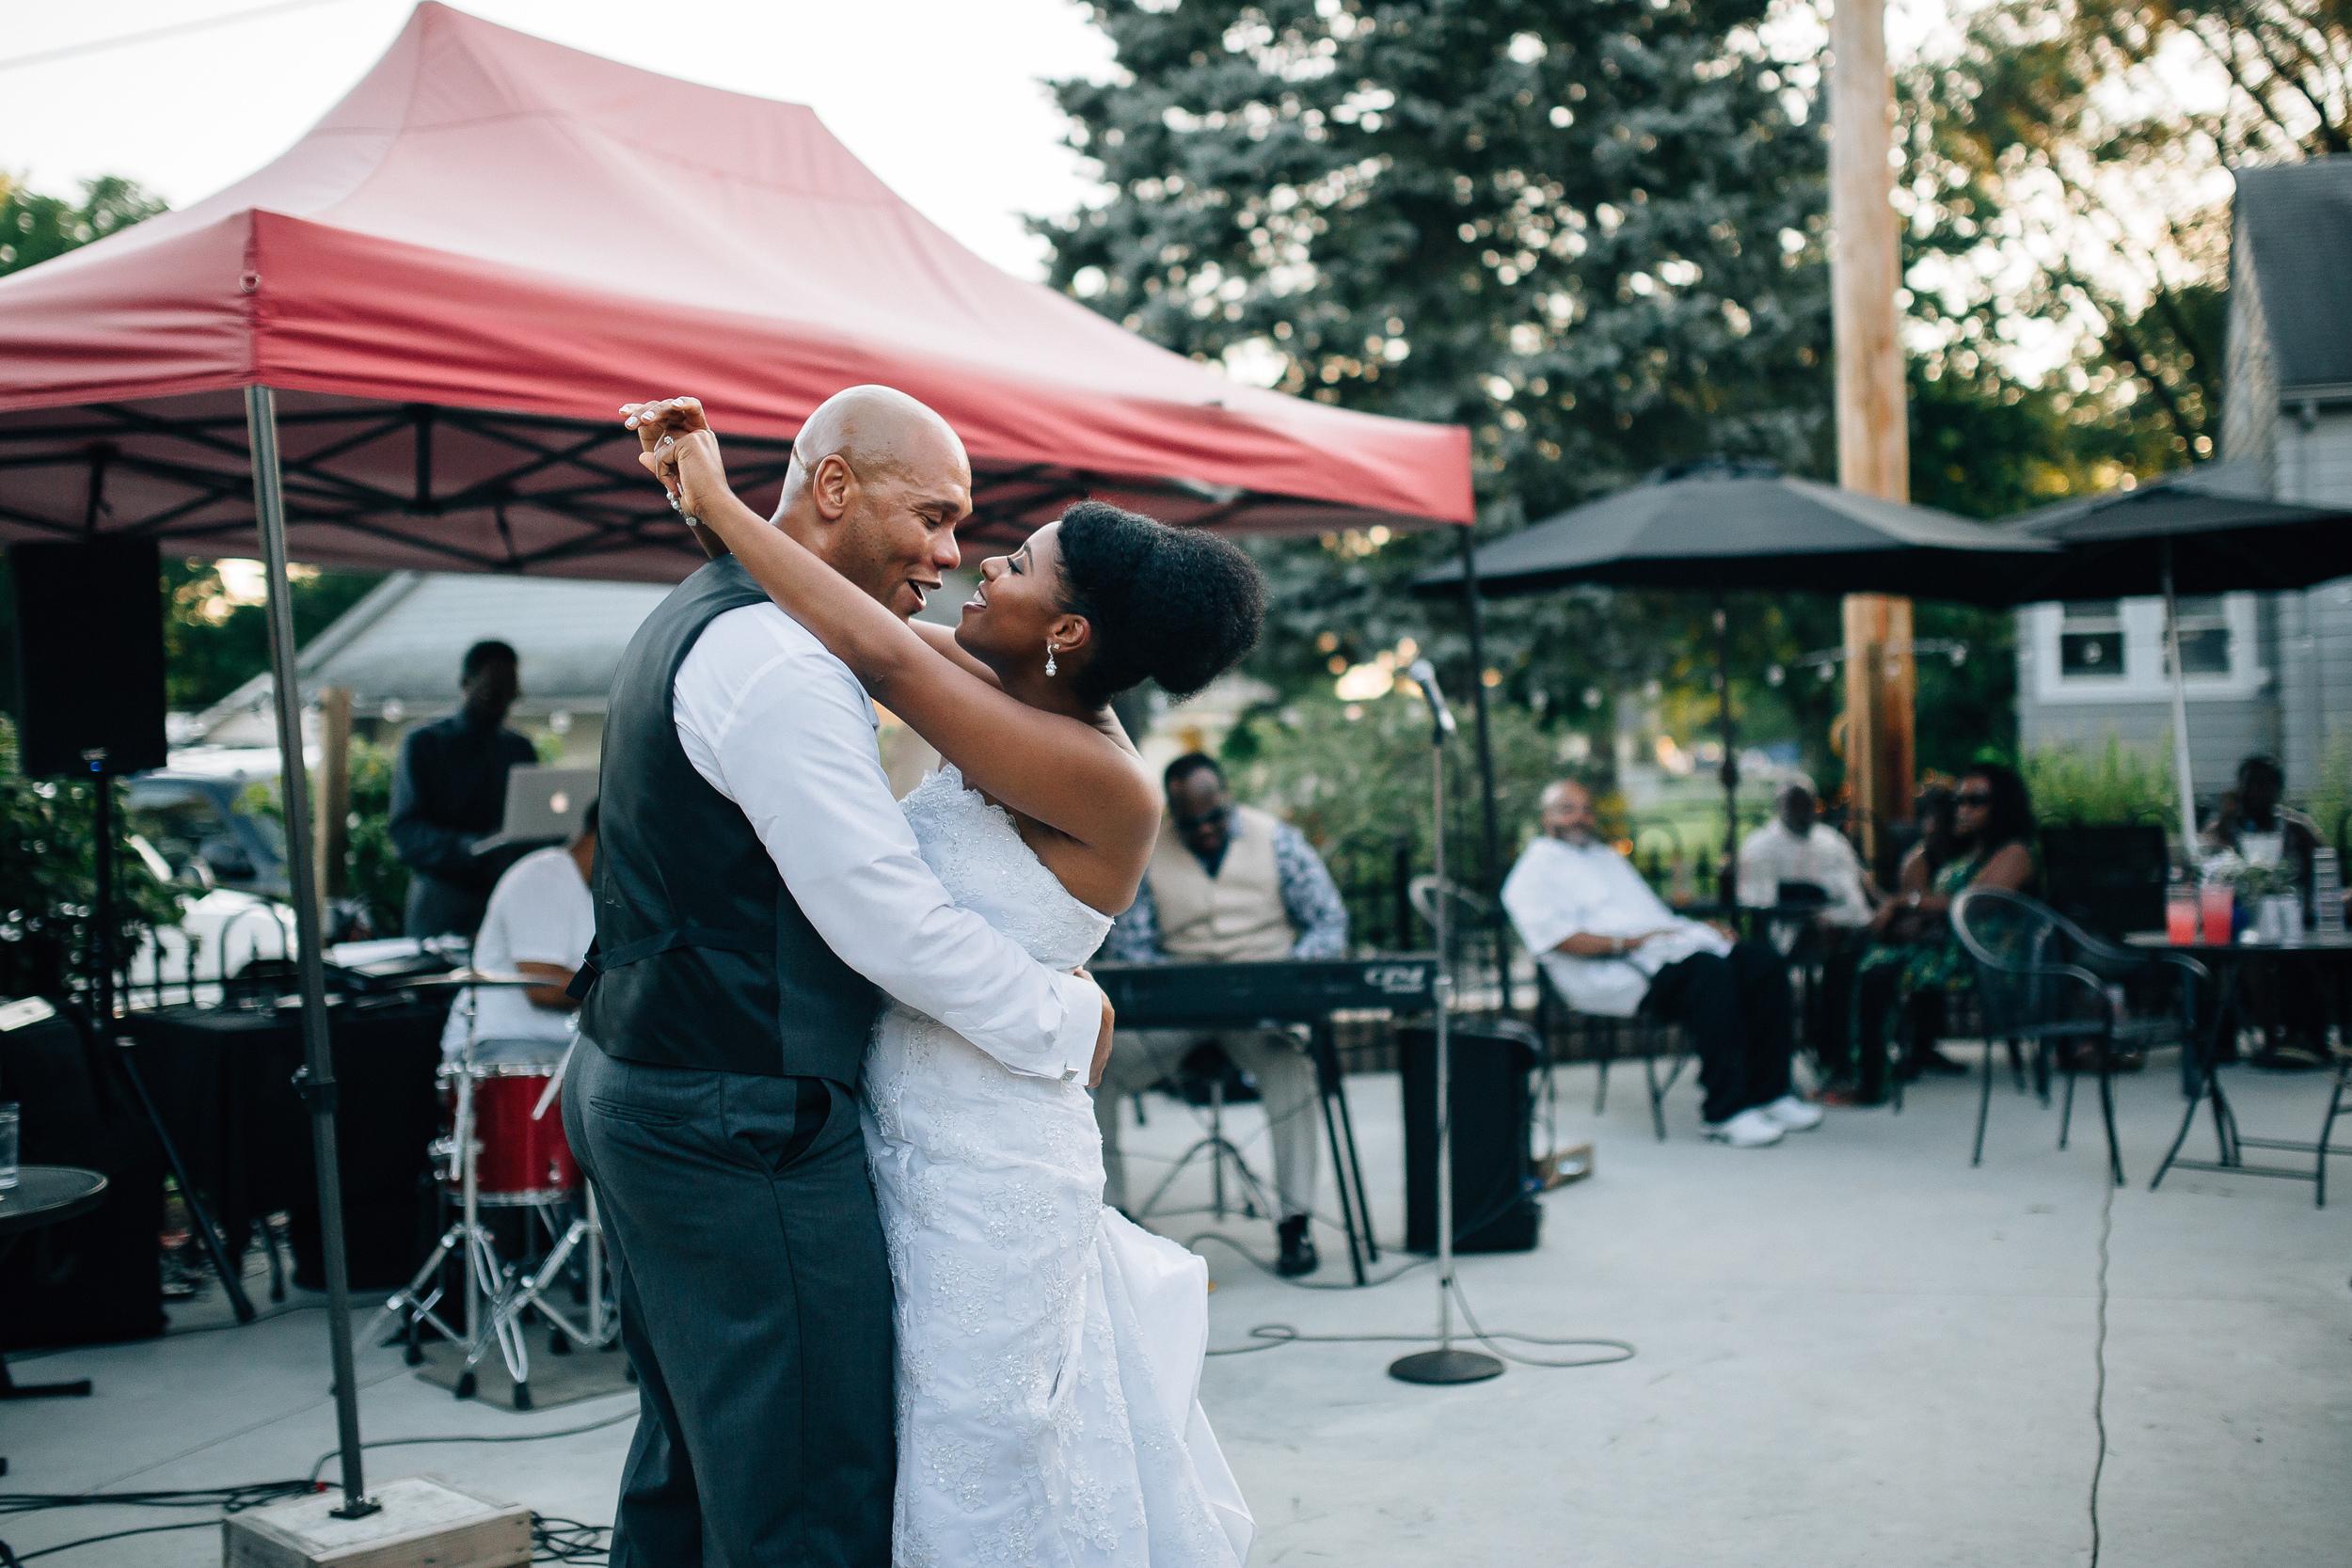 Chuck & Alicia's Wedding - Corrie Mick Photography-633.jpg